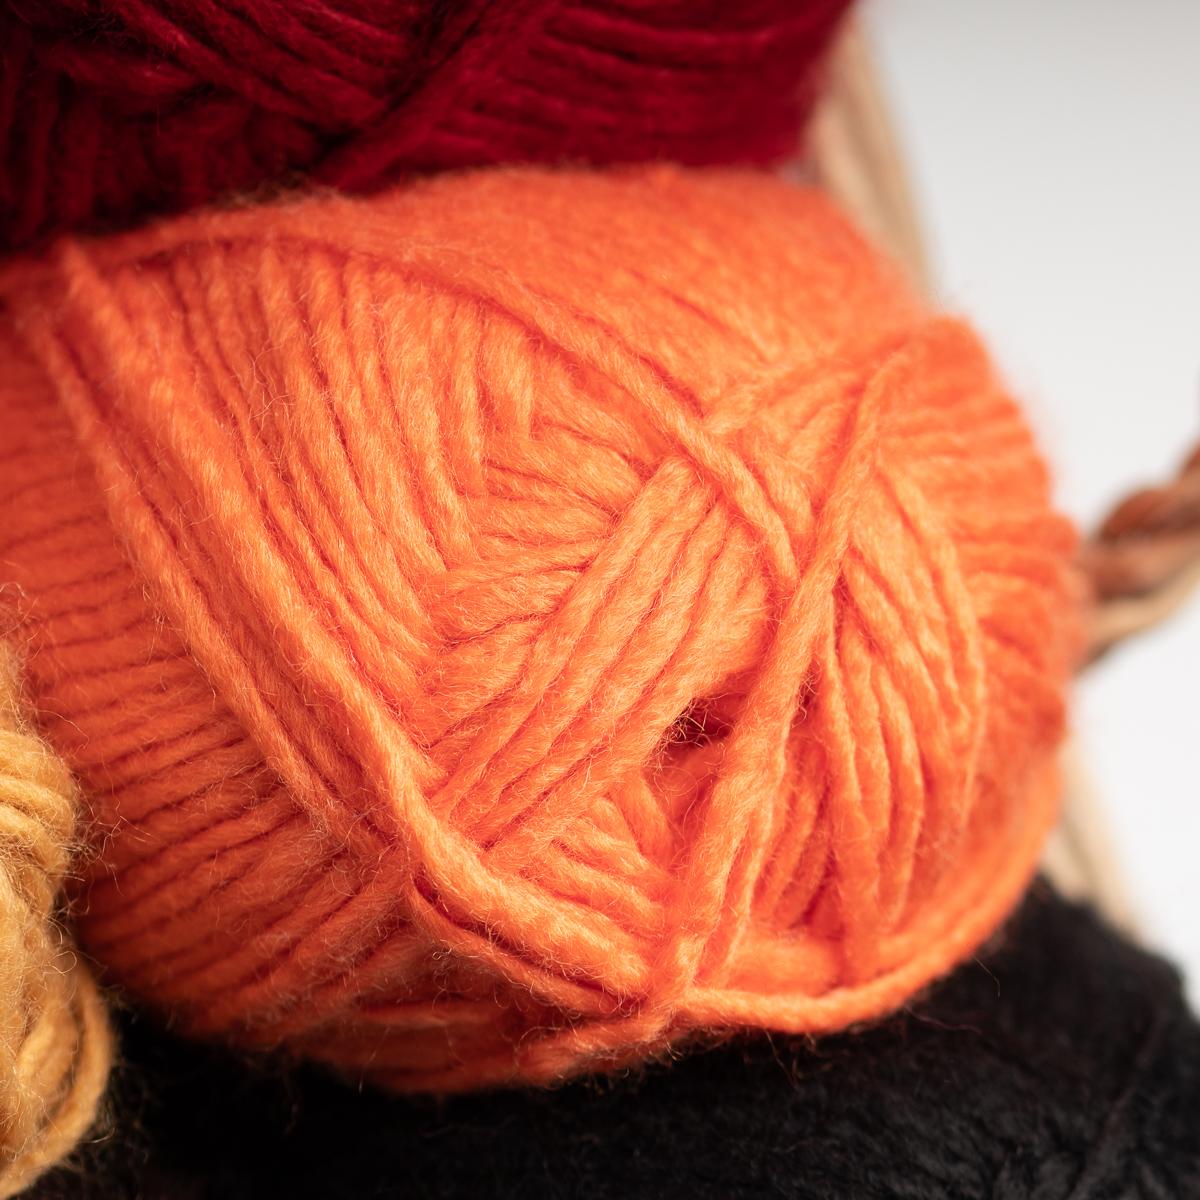 3pk-Lion-Brand-New-Basic-Acrylic-amp-Wool-Yarn-Medium-4-Knit-Crochet-Skeins-Soft thumbnail 78